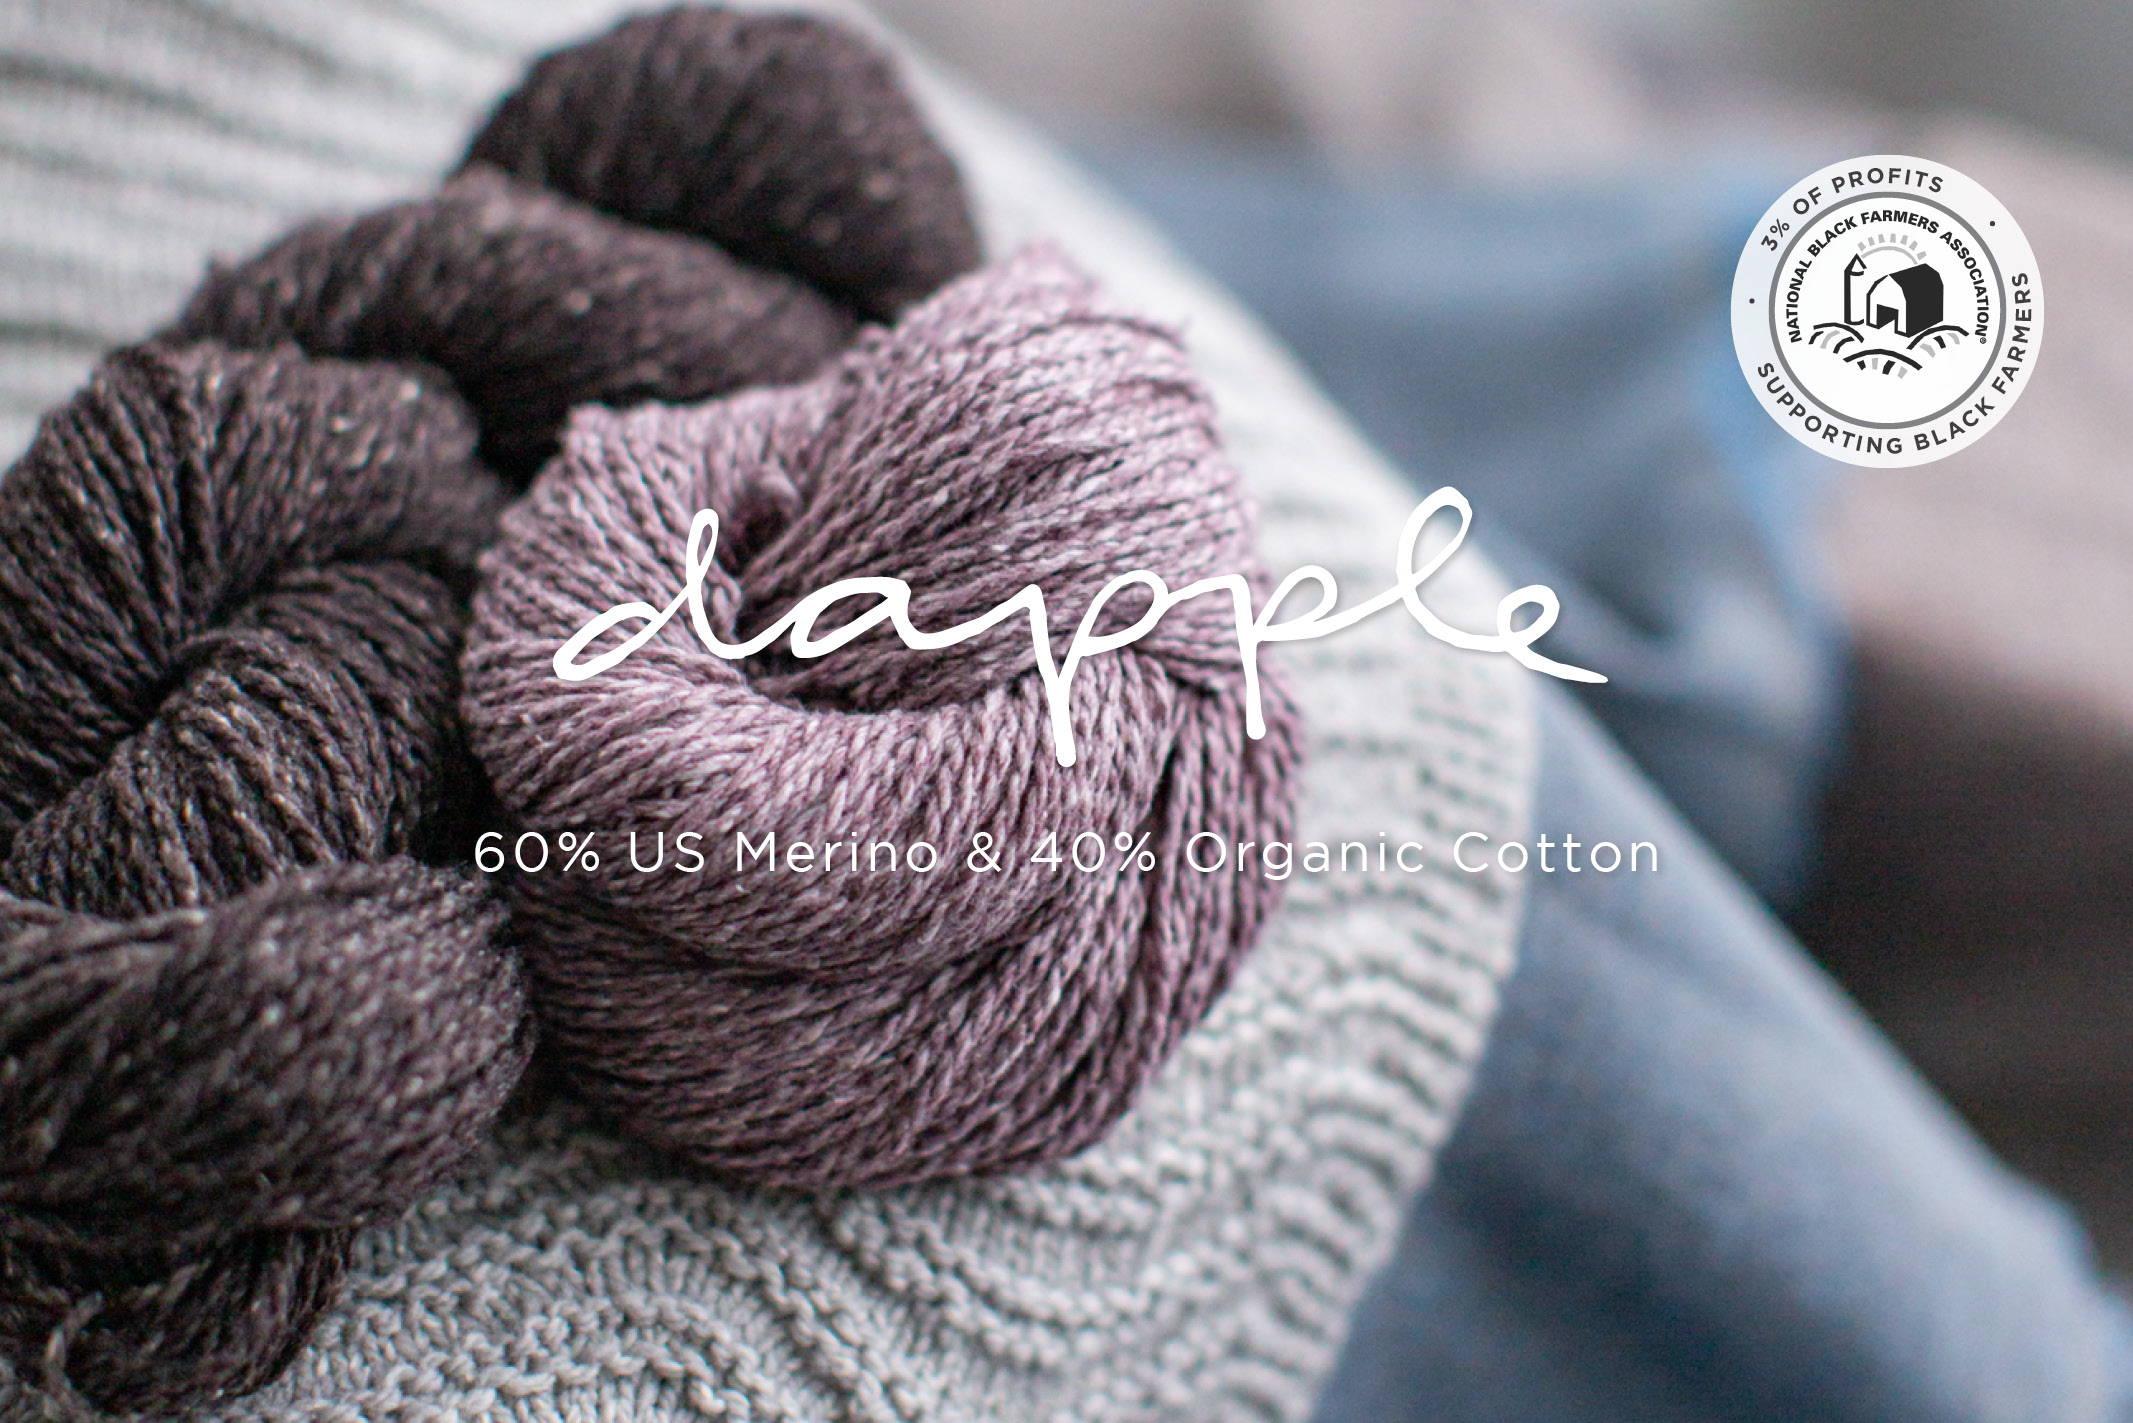 Dapple Yarn balls on table sitting on knitted fabric | 60% US Merino & 40% Organic Cotton